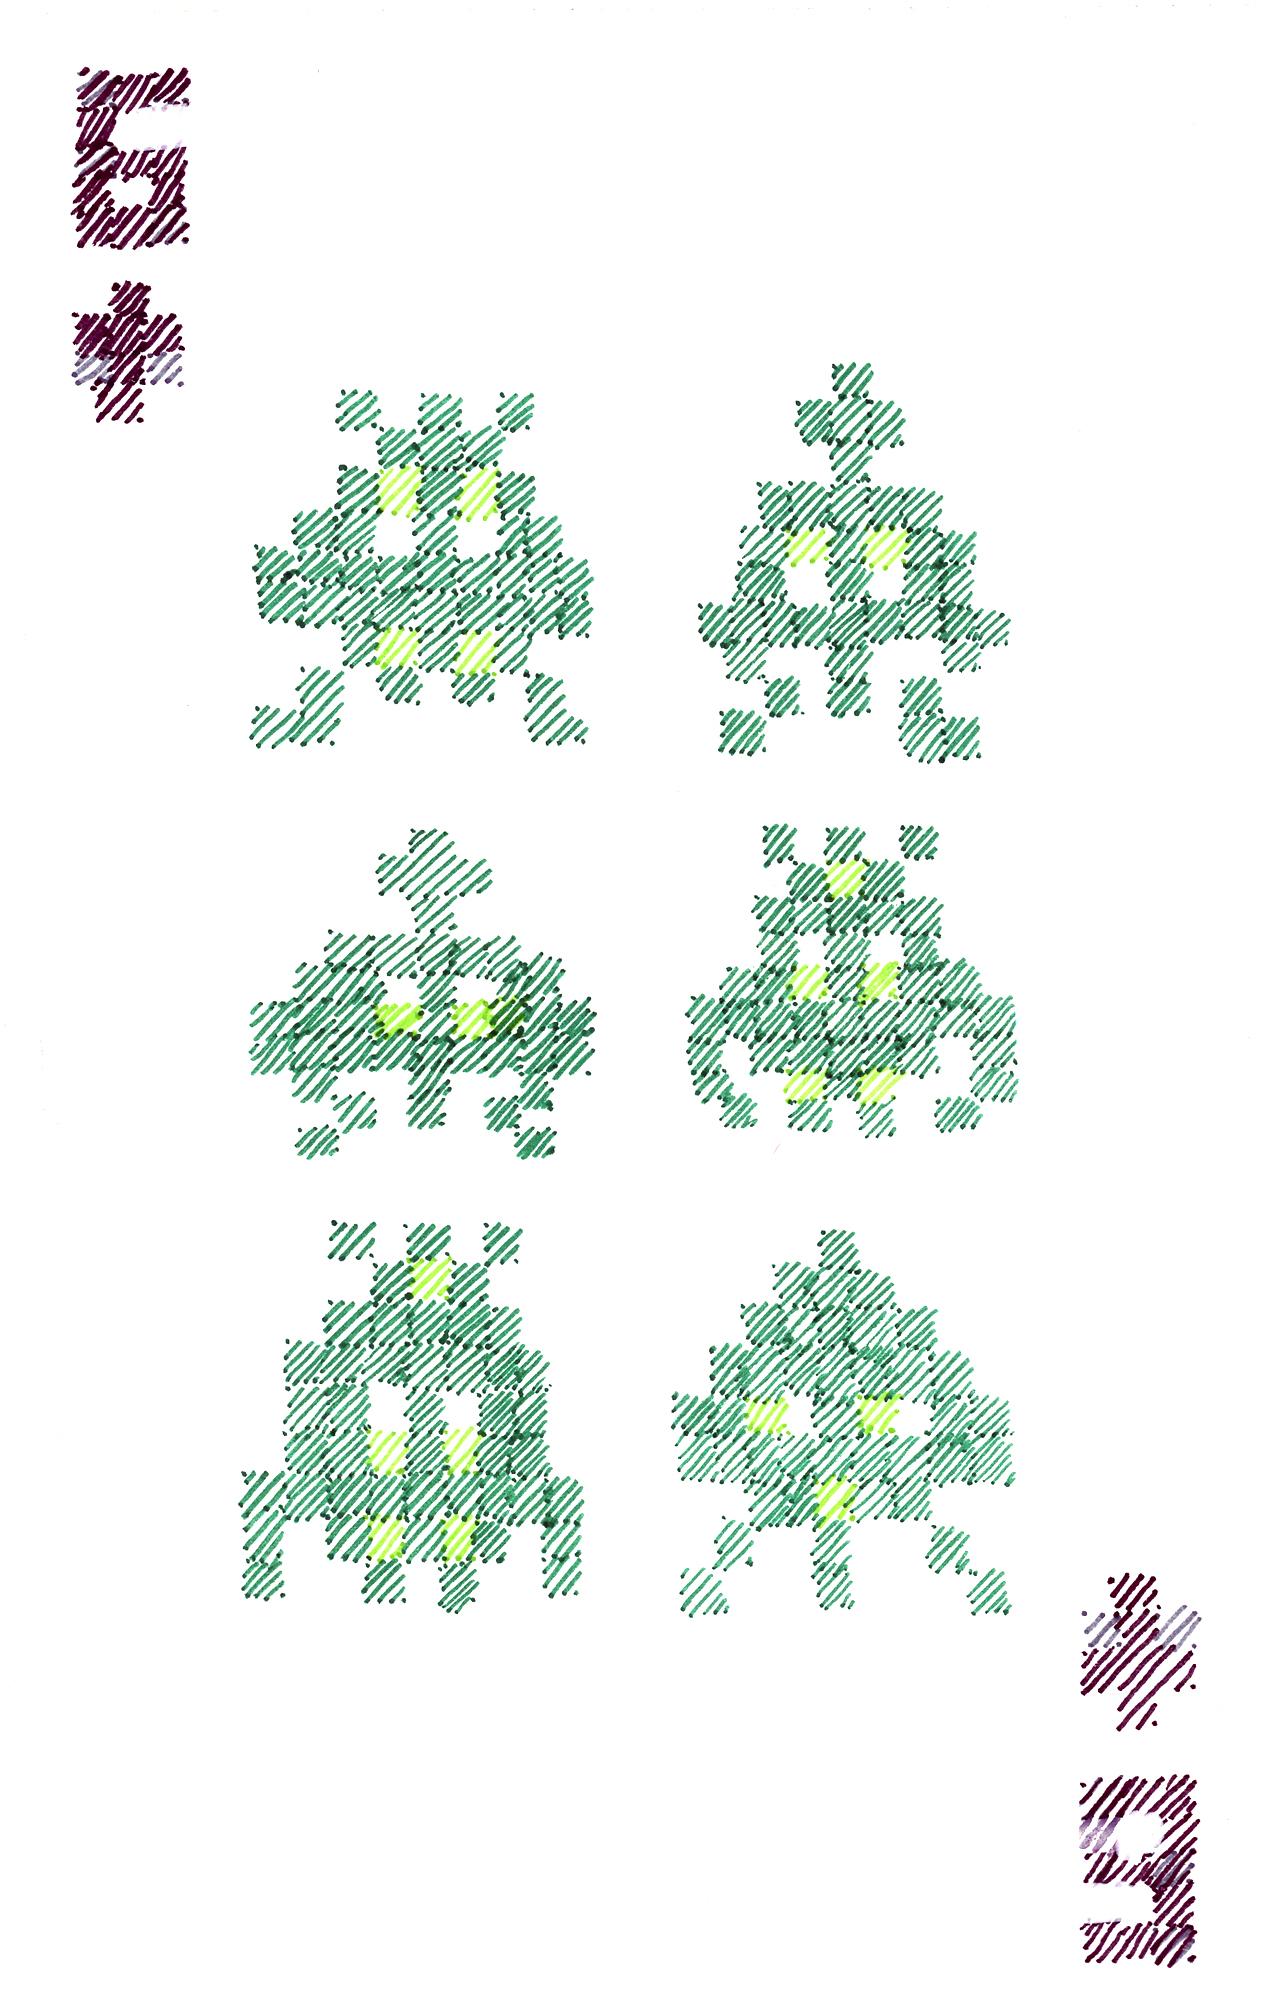 6 of clubs invaders.jpg